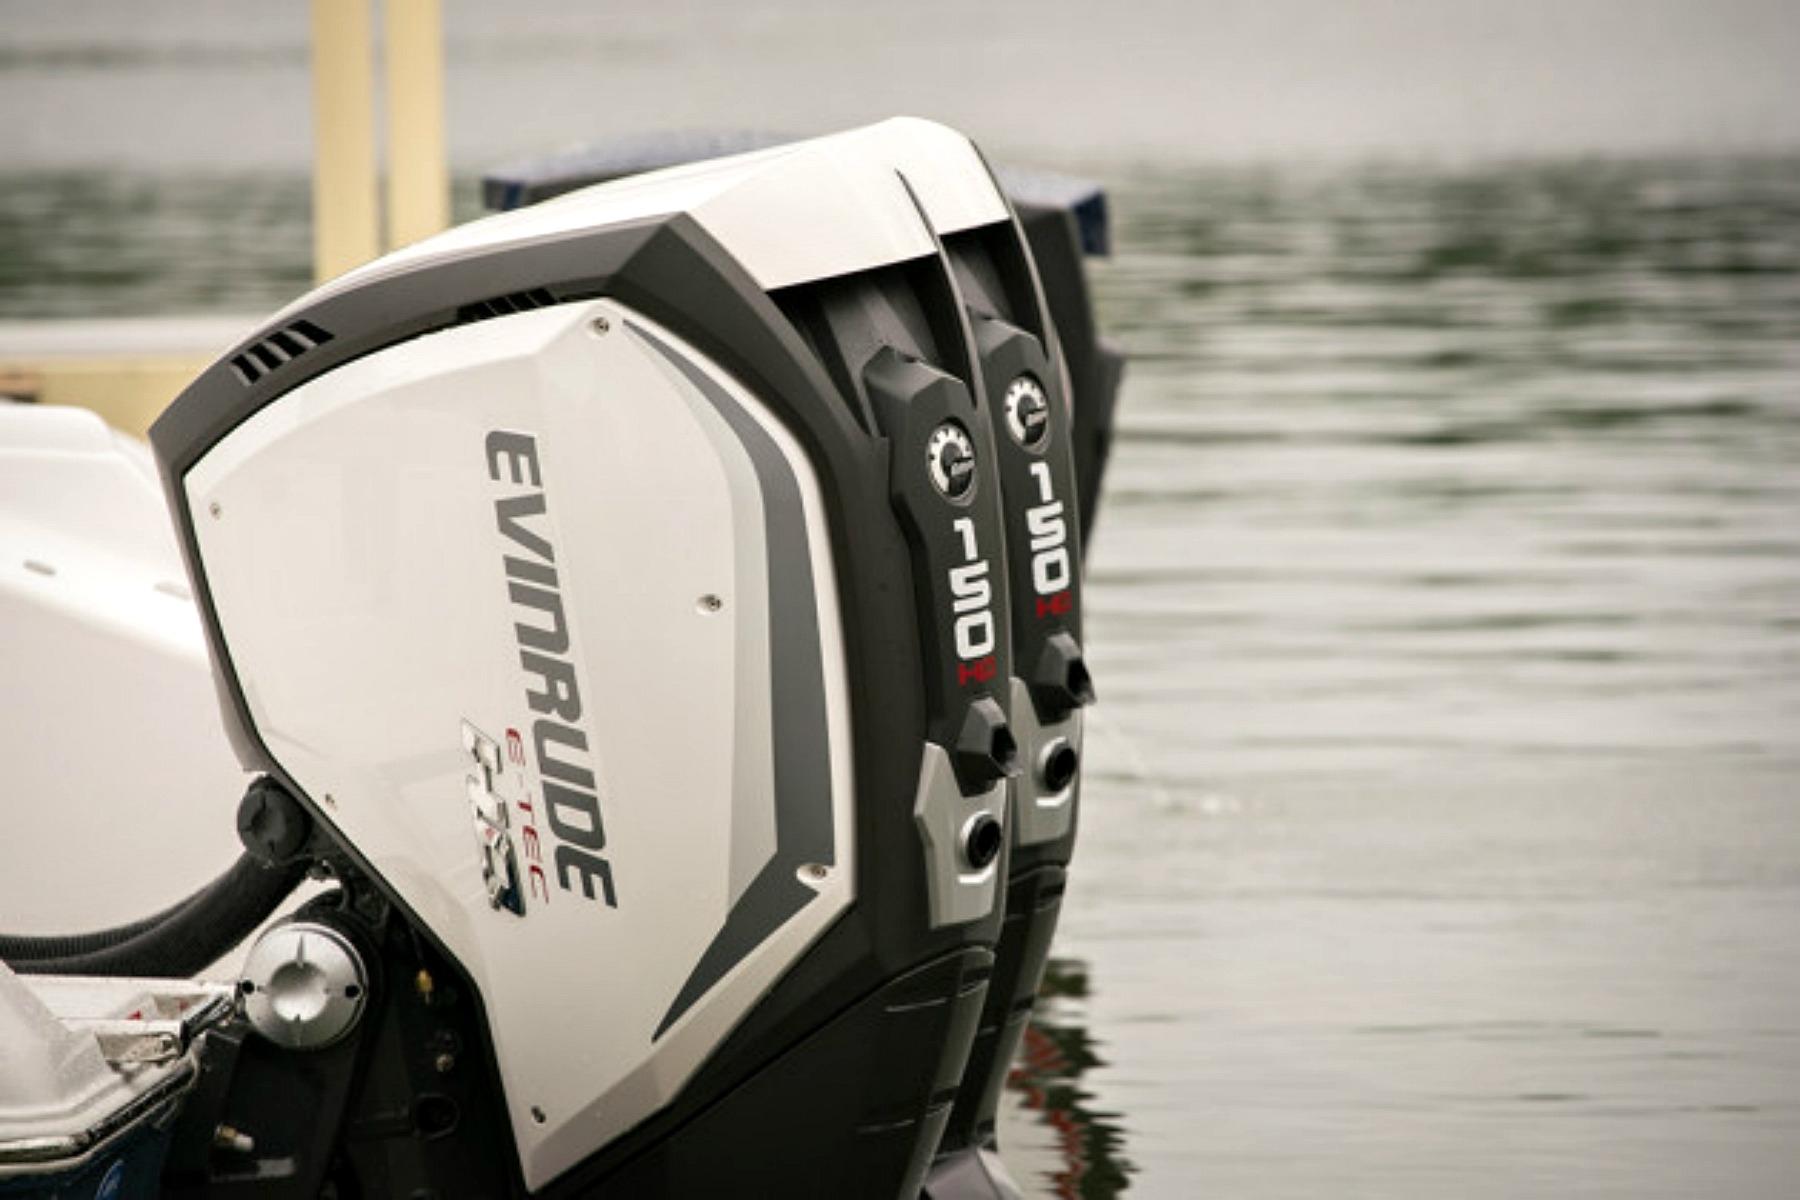 Evinrude ETEC G2 150 PL Outboard Motor